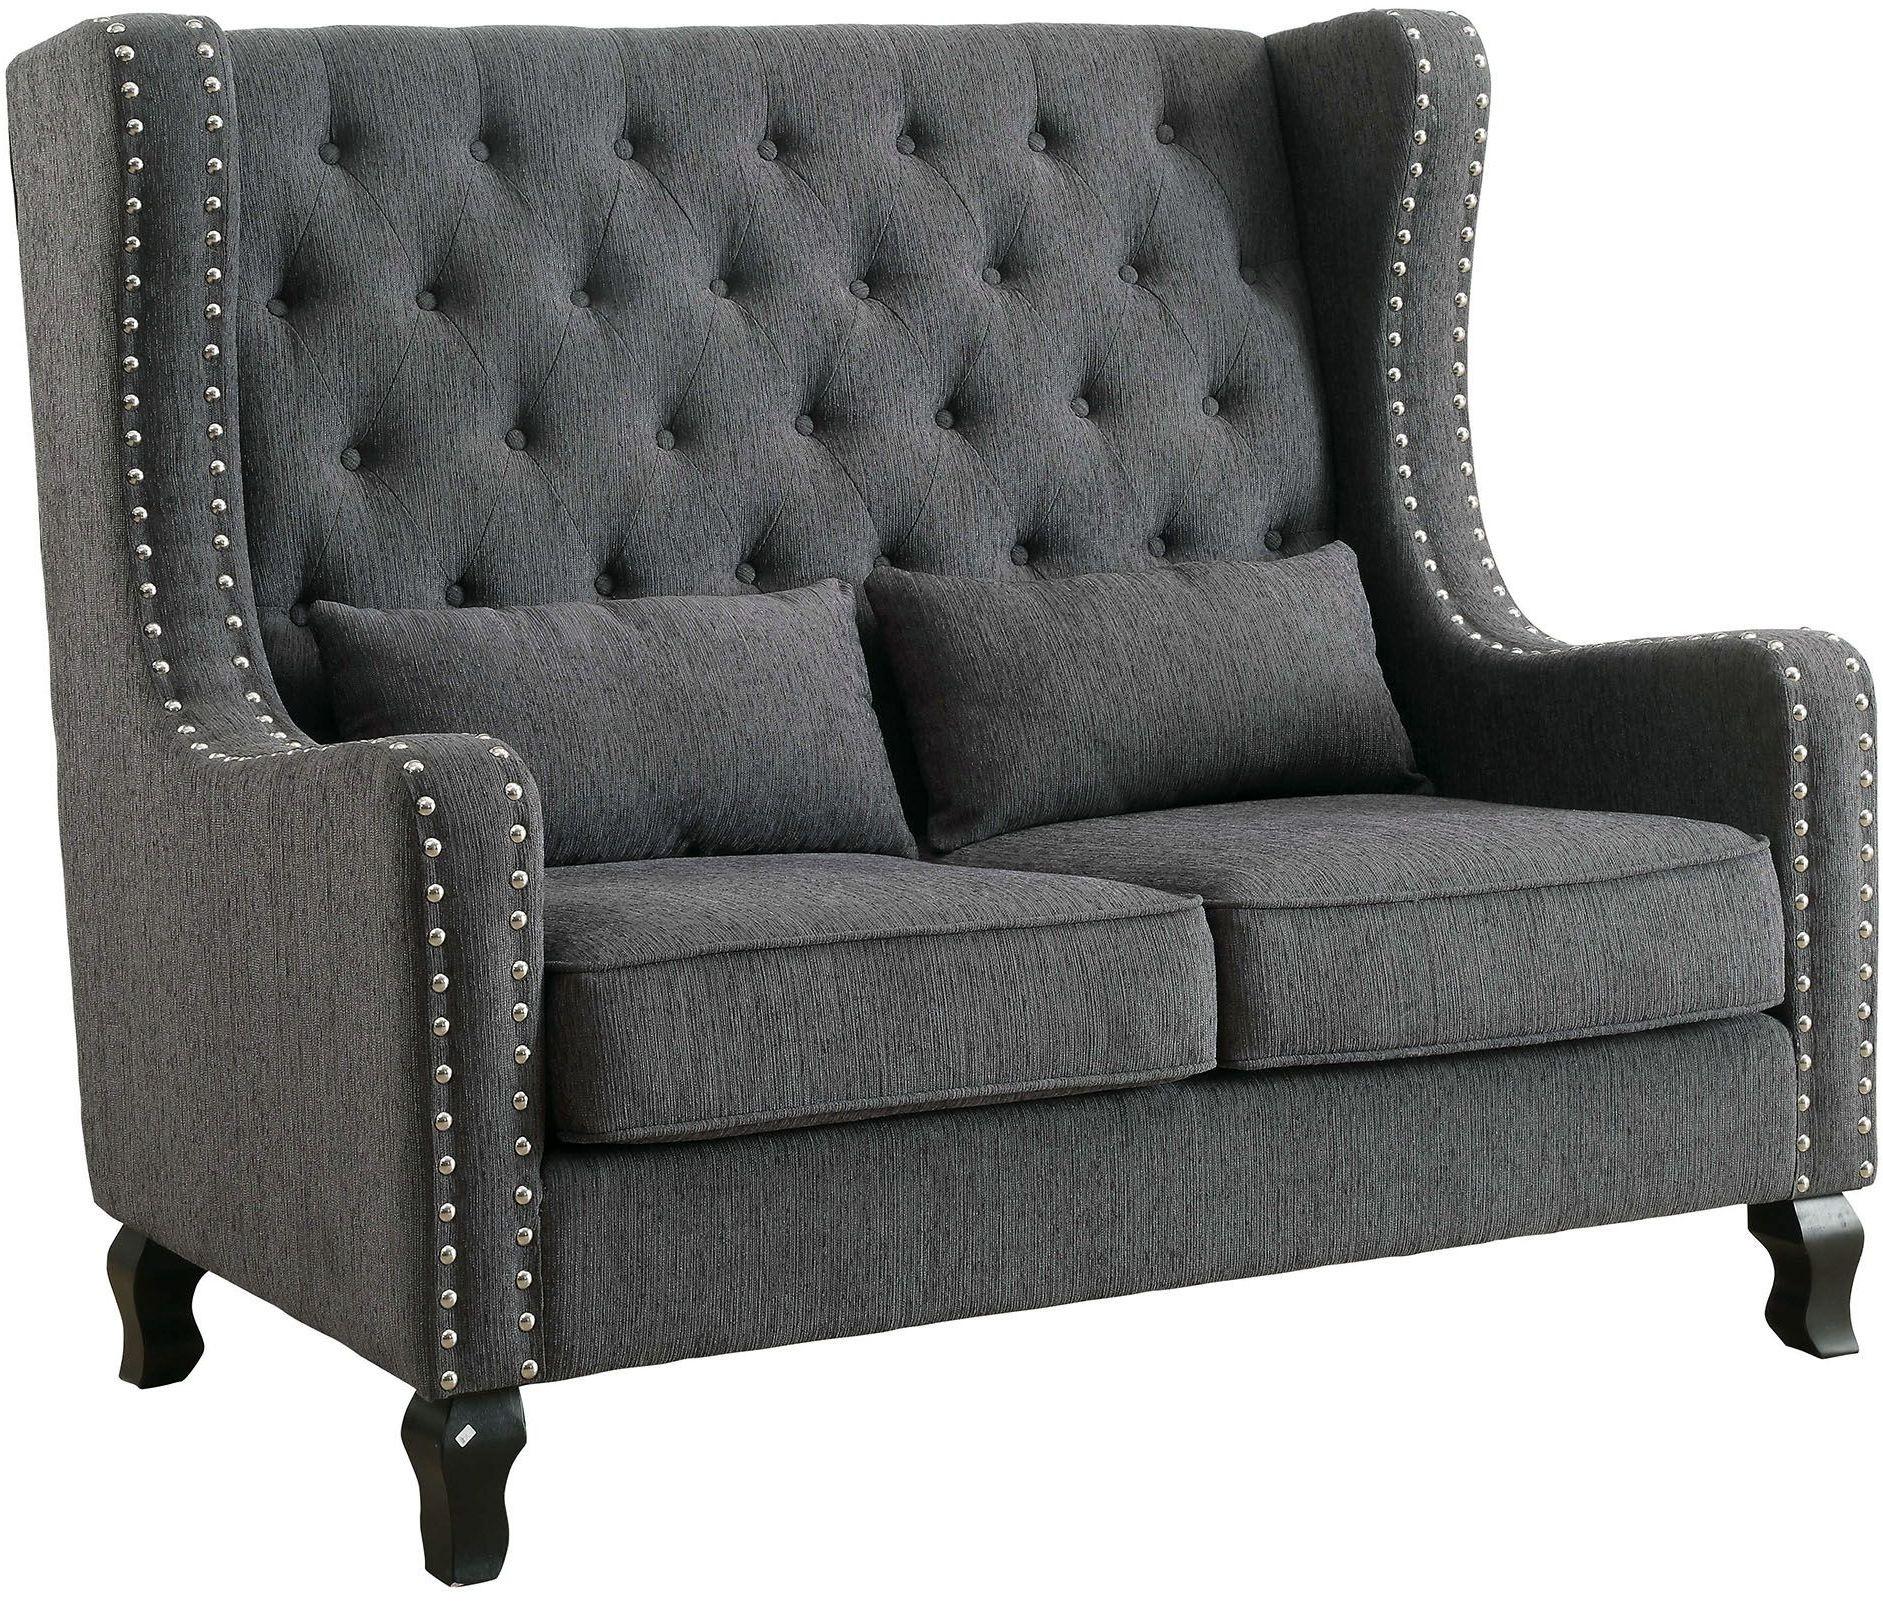 Alicante Gray Loveseat Bench Cm Bn6449gy Pk Furniture Of